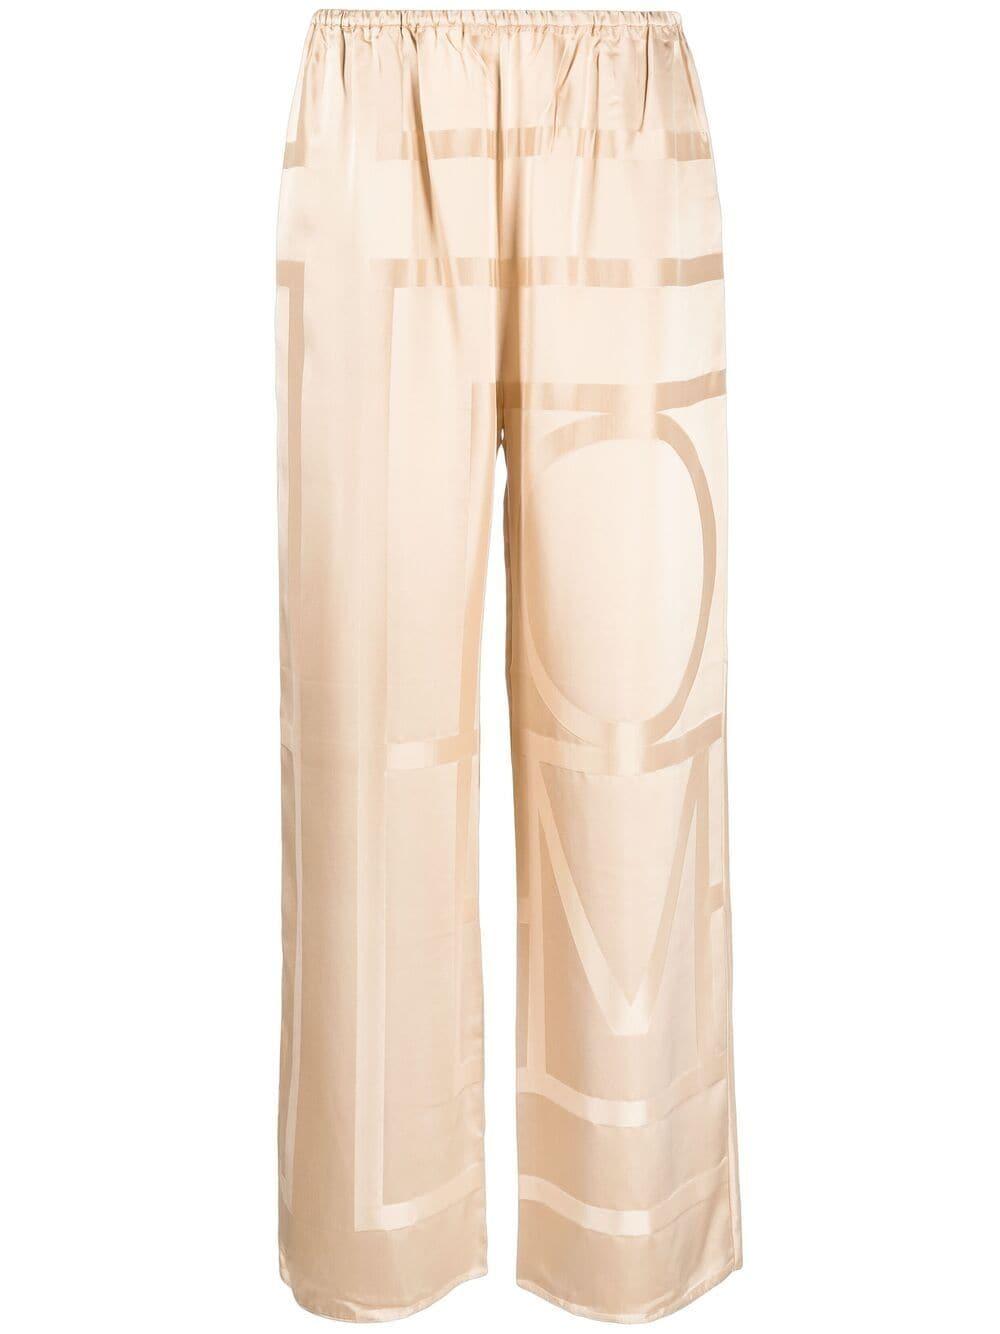 Toteme pantalone cafe au lait donna TOTEME   Pantaloni   212255724803